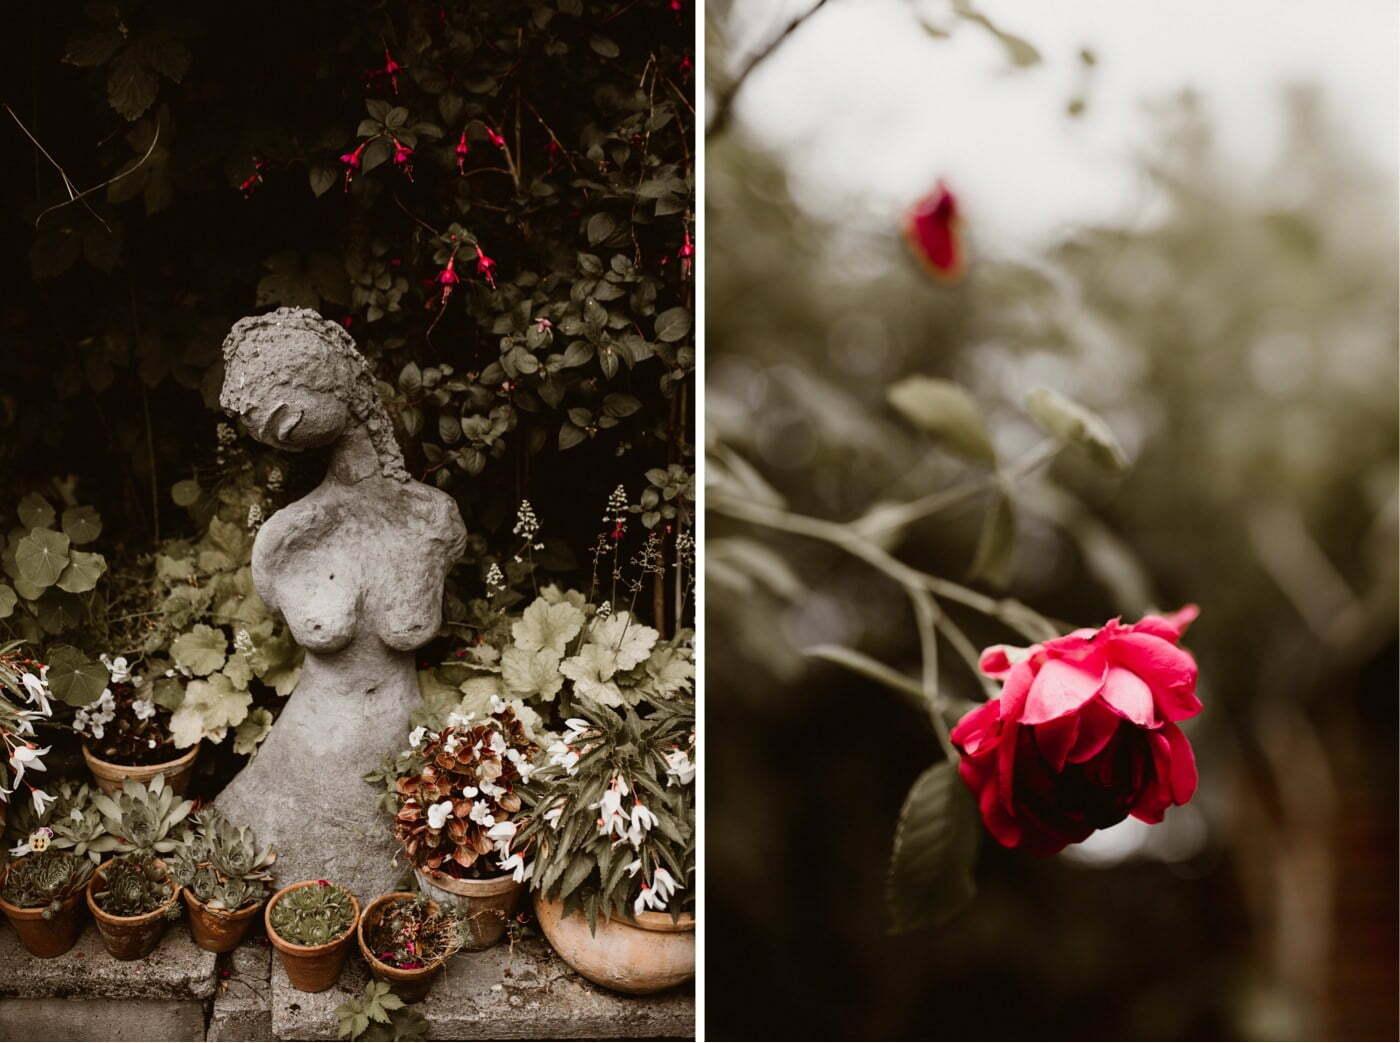 ewelina zieba rustykalne wesele stara oranzeria warszawa 004